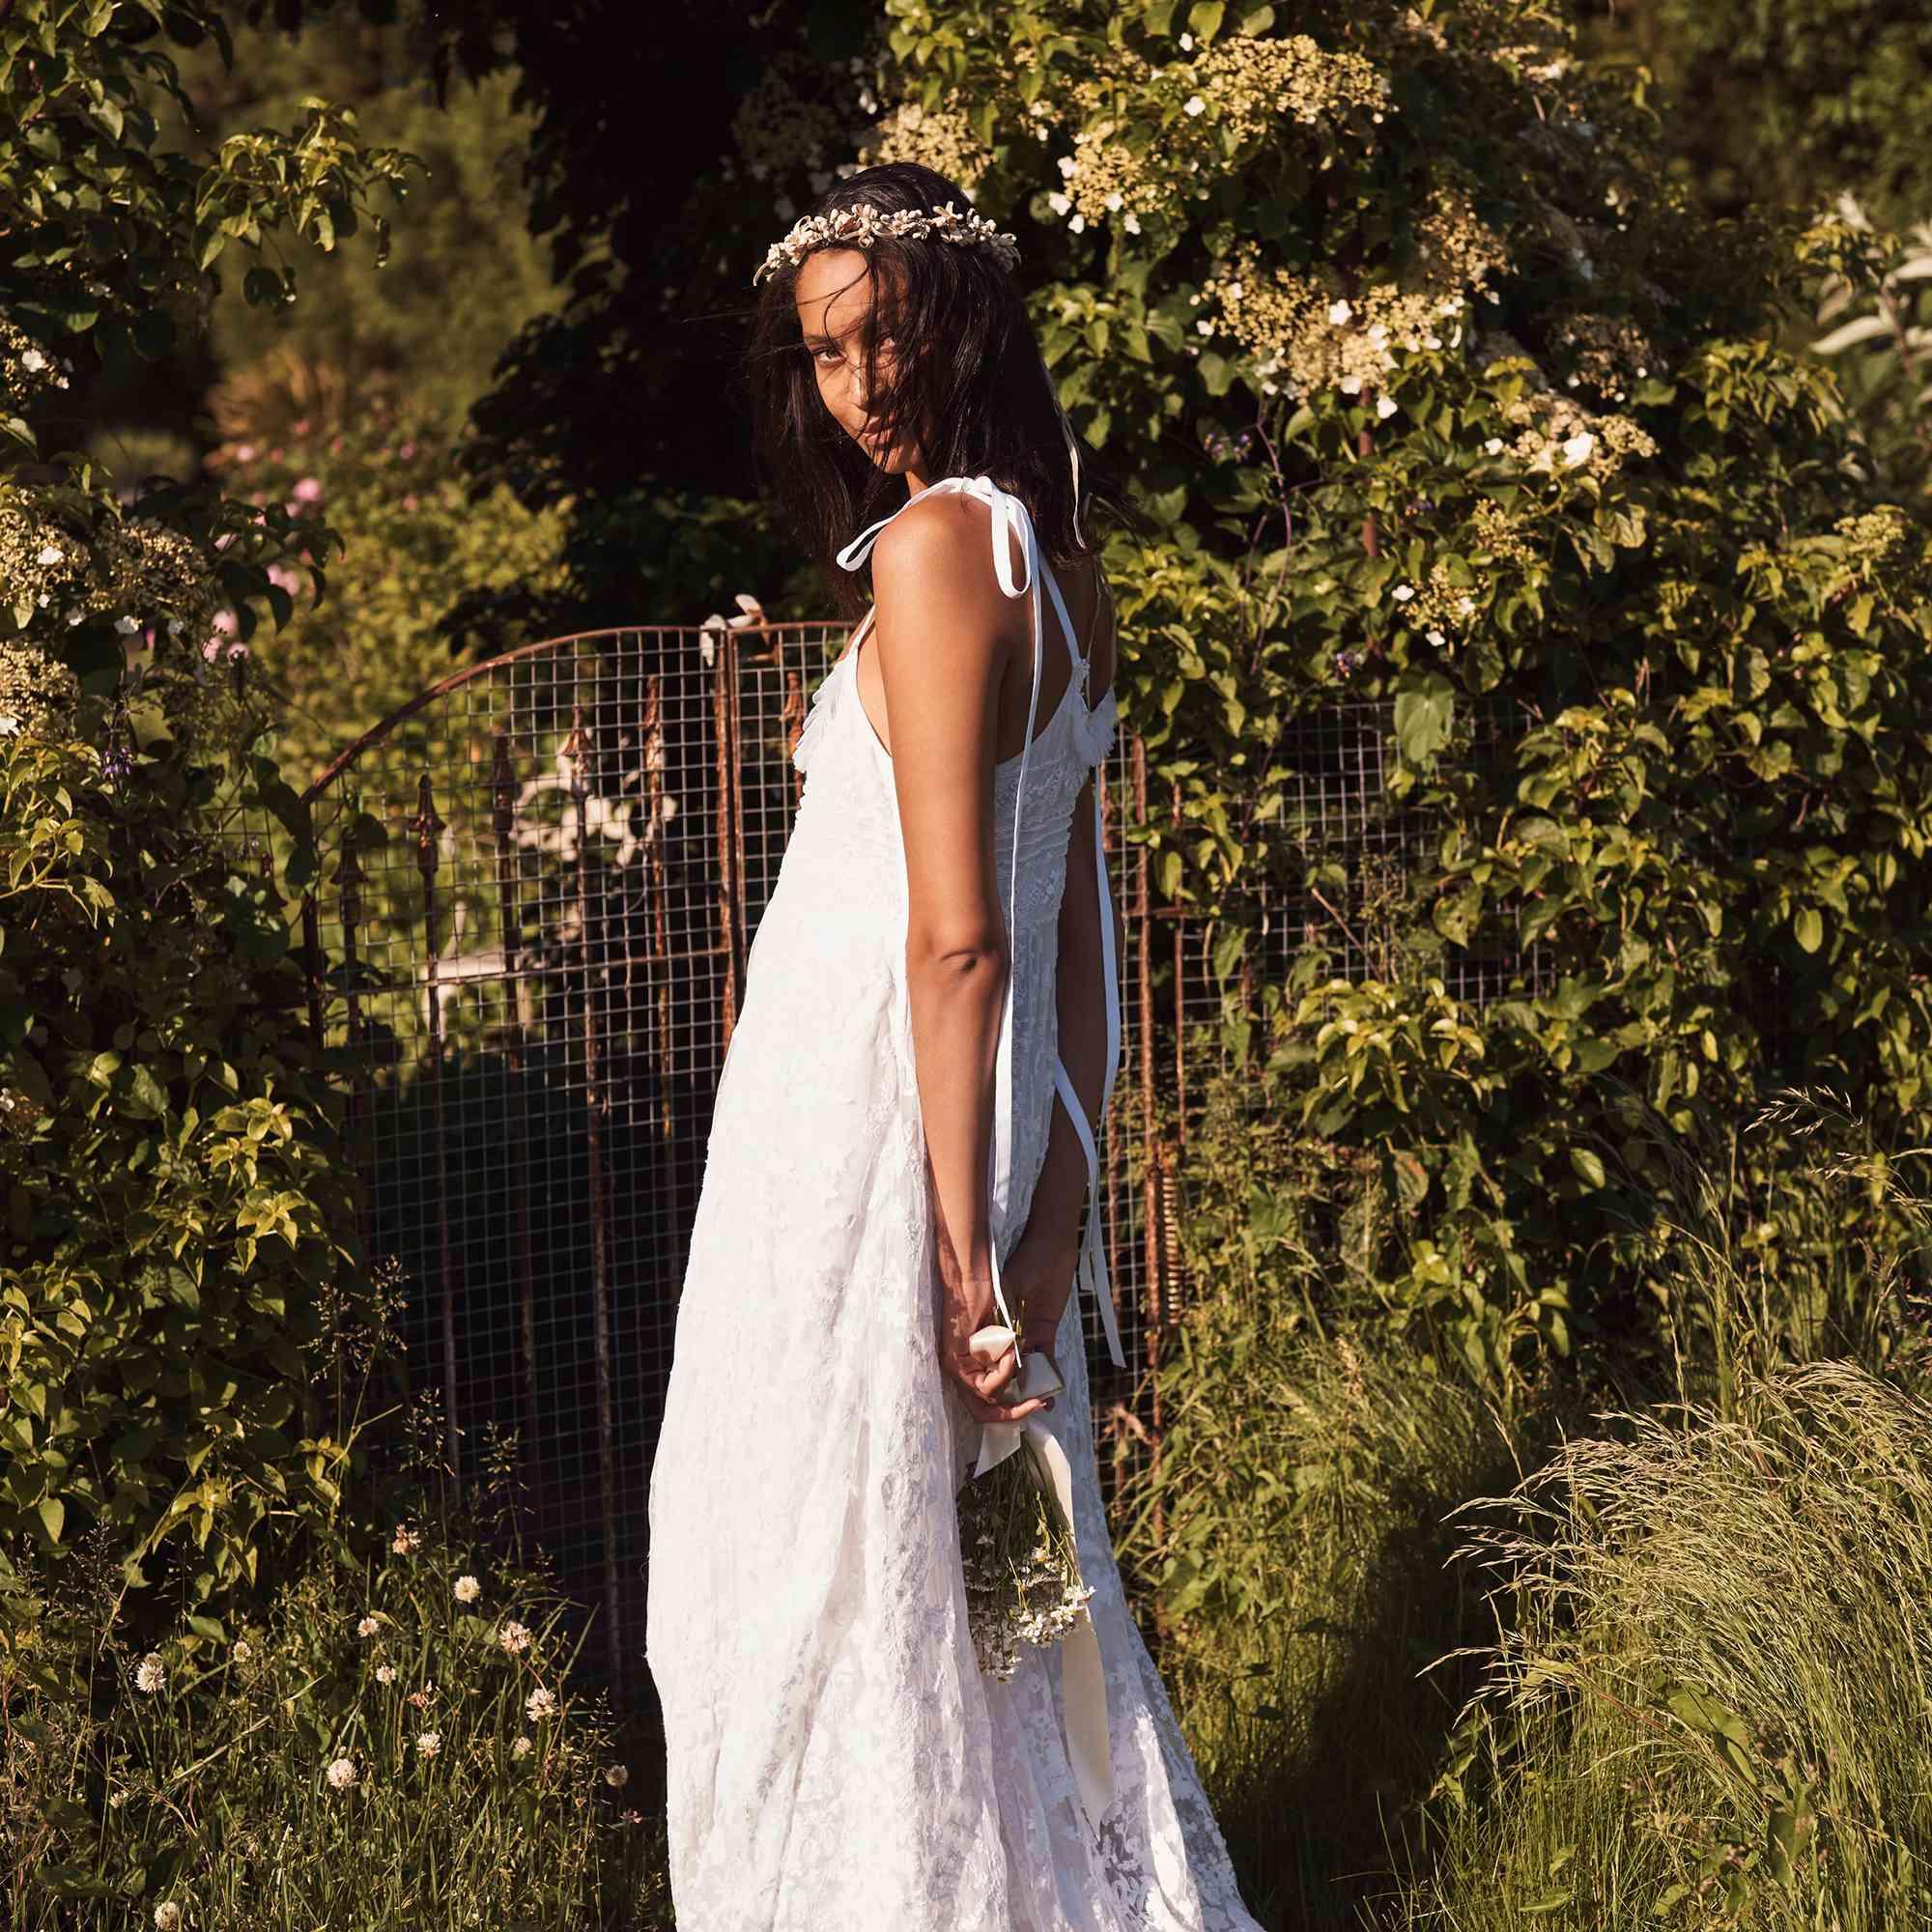 bridal separates two piece wedding dress Bach wedding dress simple wedding dress bohemian wedding dress boho wedding dress wedding top